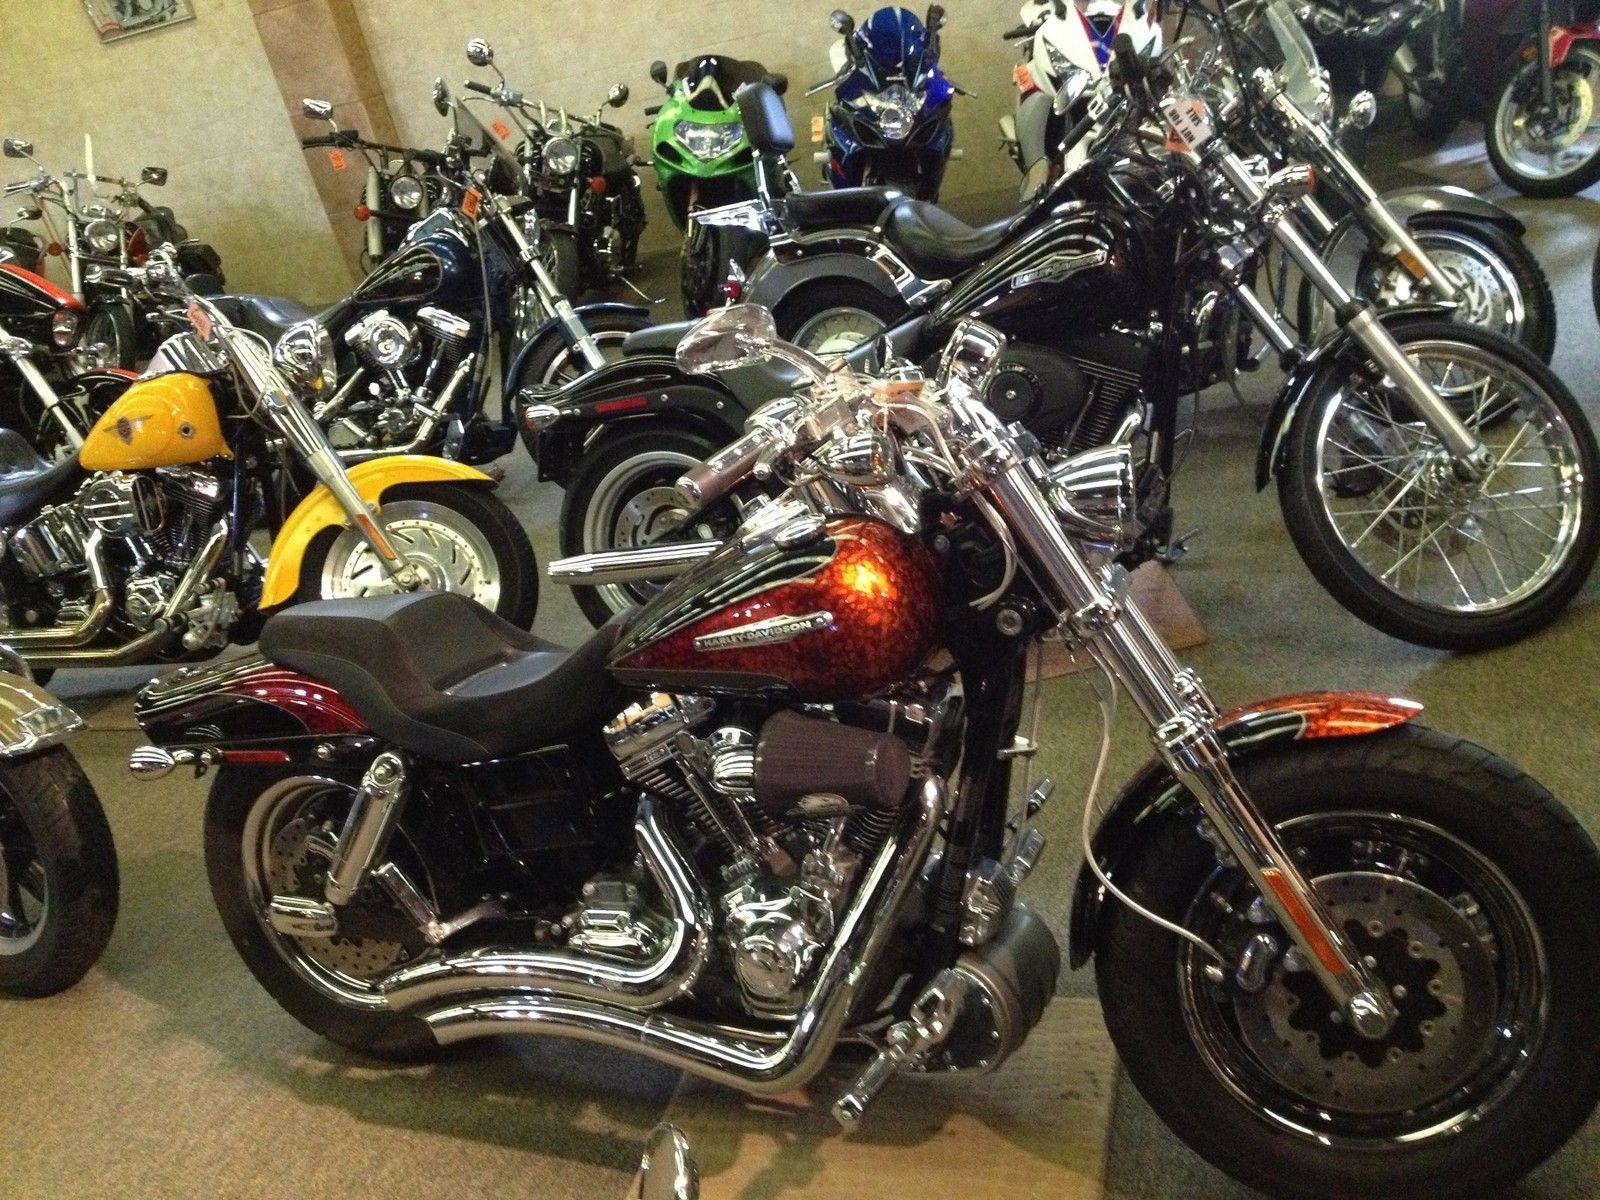 Harley-Davidson : Dyna 2009 HARLEY FXDFSE DYNA FAT BOB SE BLACK DIAMOND / FIRE QUARTZ 5599 MILES DW869